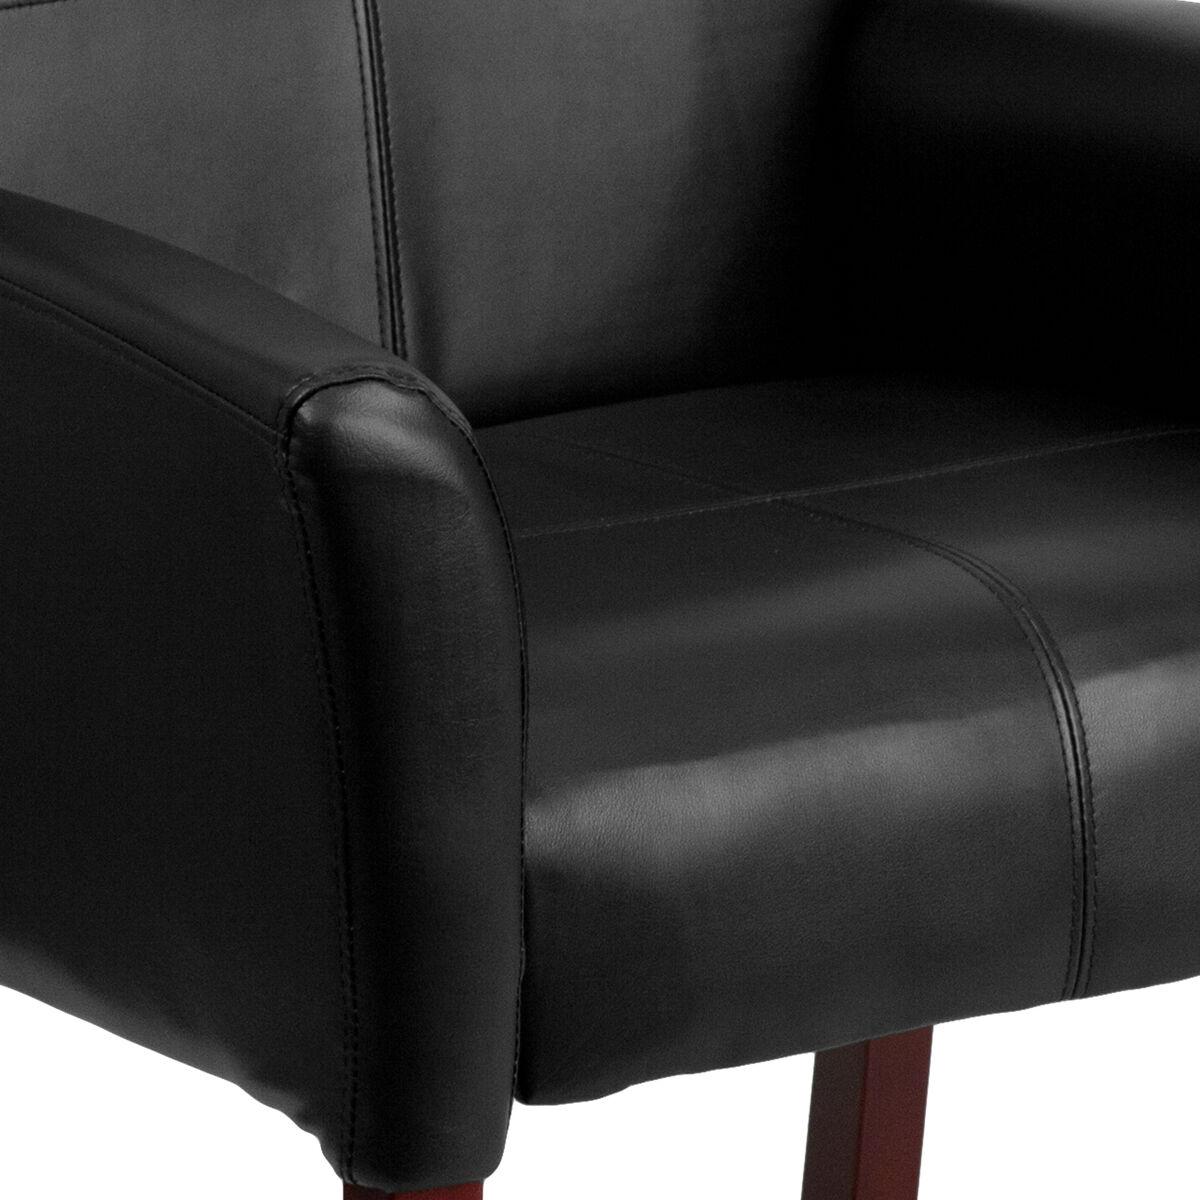 Black Leather Side Chair Bt 353 Bk Lea Gg Bizchair Com